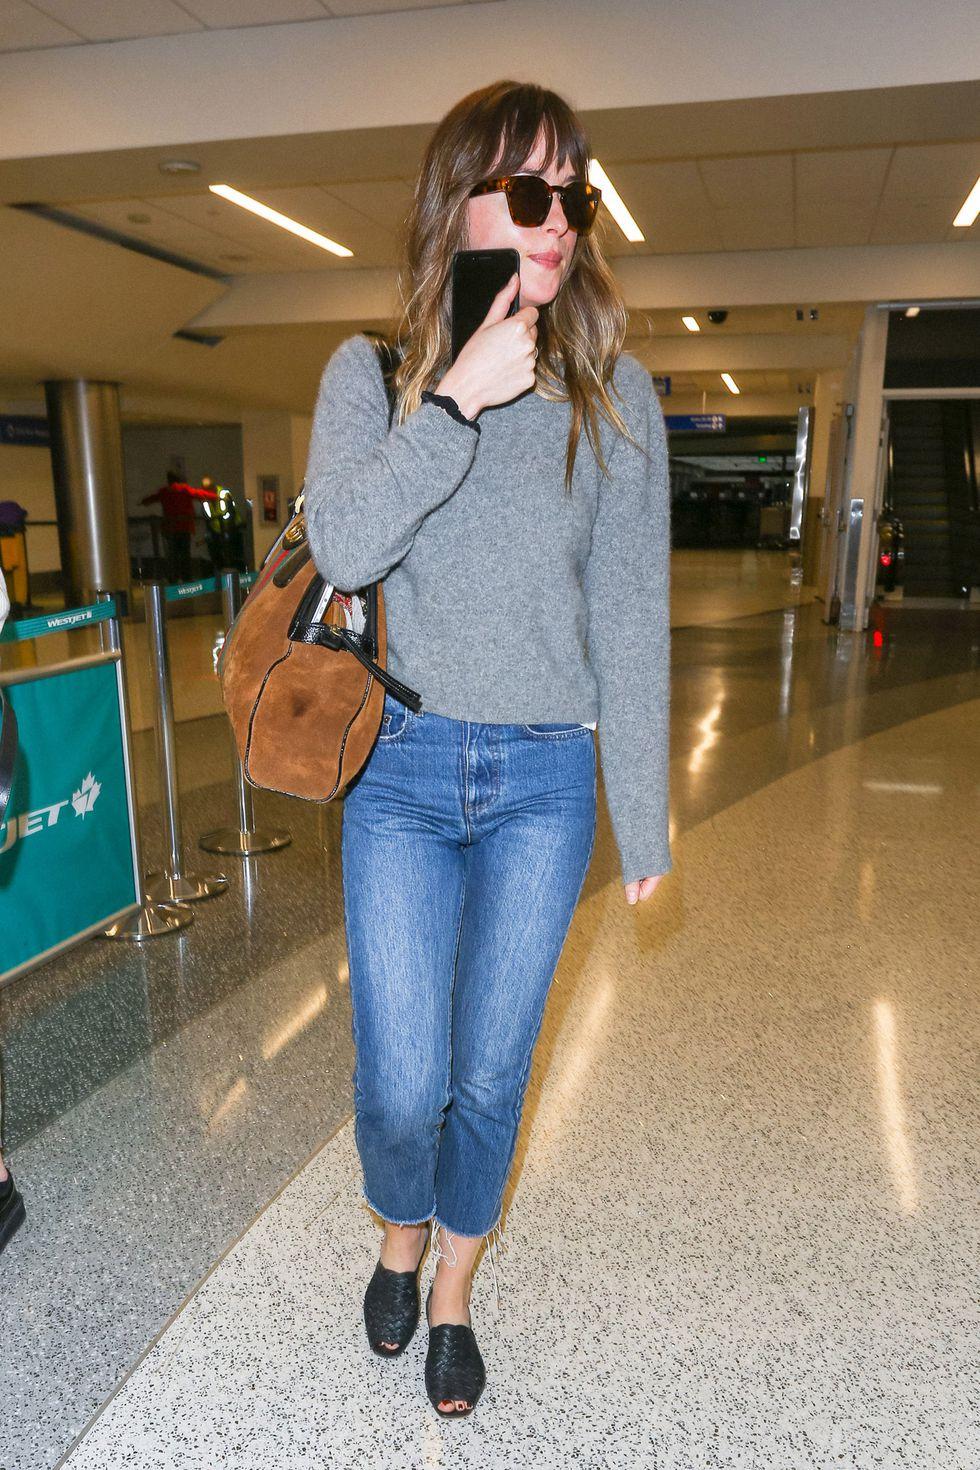 Airport Style: Πώς ταξιδεύουν οι πιο στιλάτες κυρίες της showbiz; Πώς θα συνδυάσεις την άνεση με το στυλ; Αυτές οι σταρ σου δείχνουν τον τρόπο.